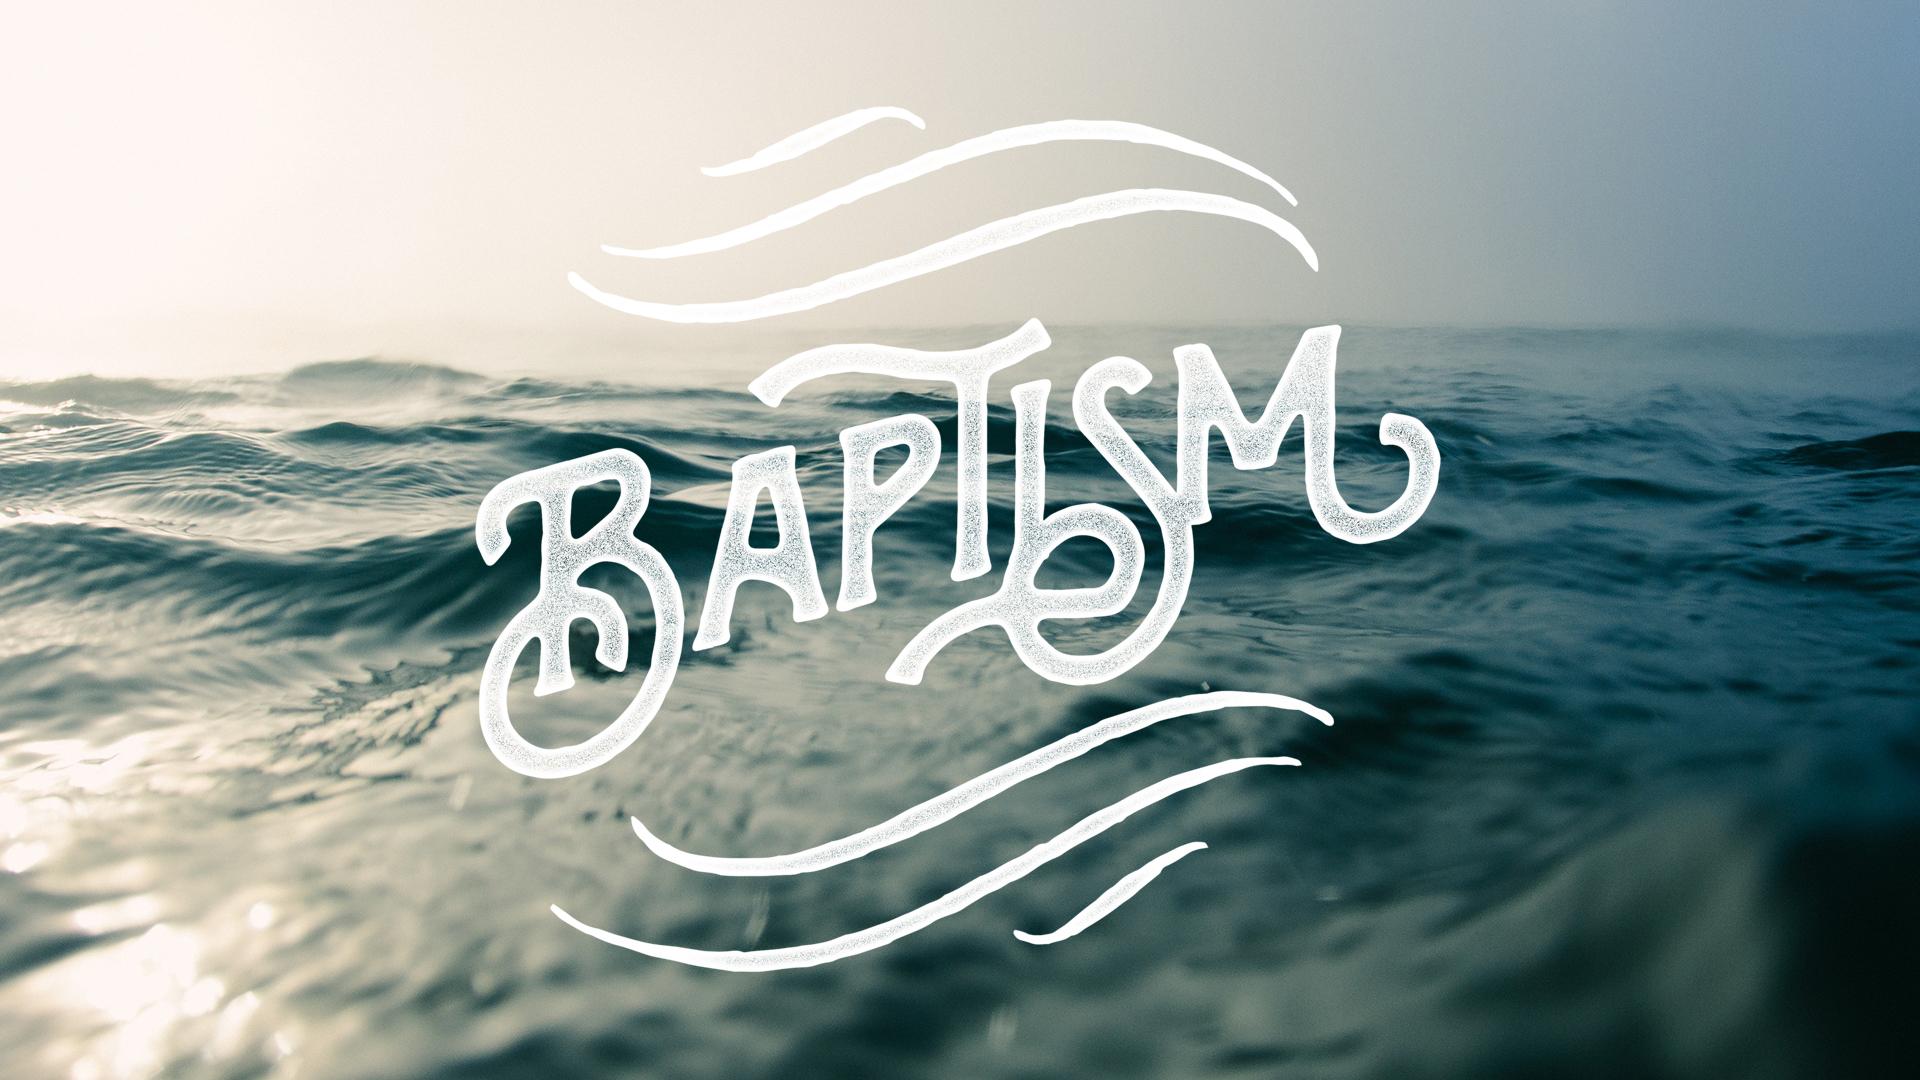 0e3876133 1417553568 baptism2014 15